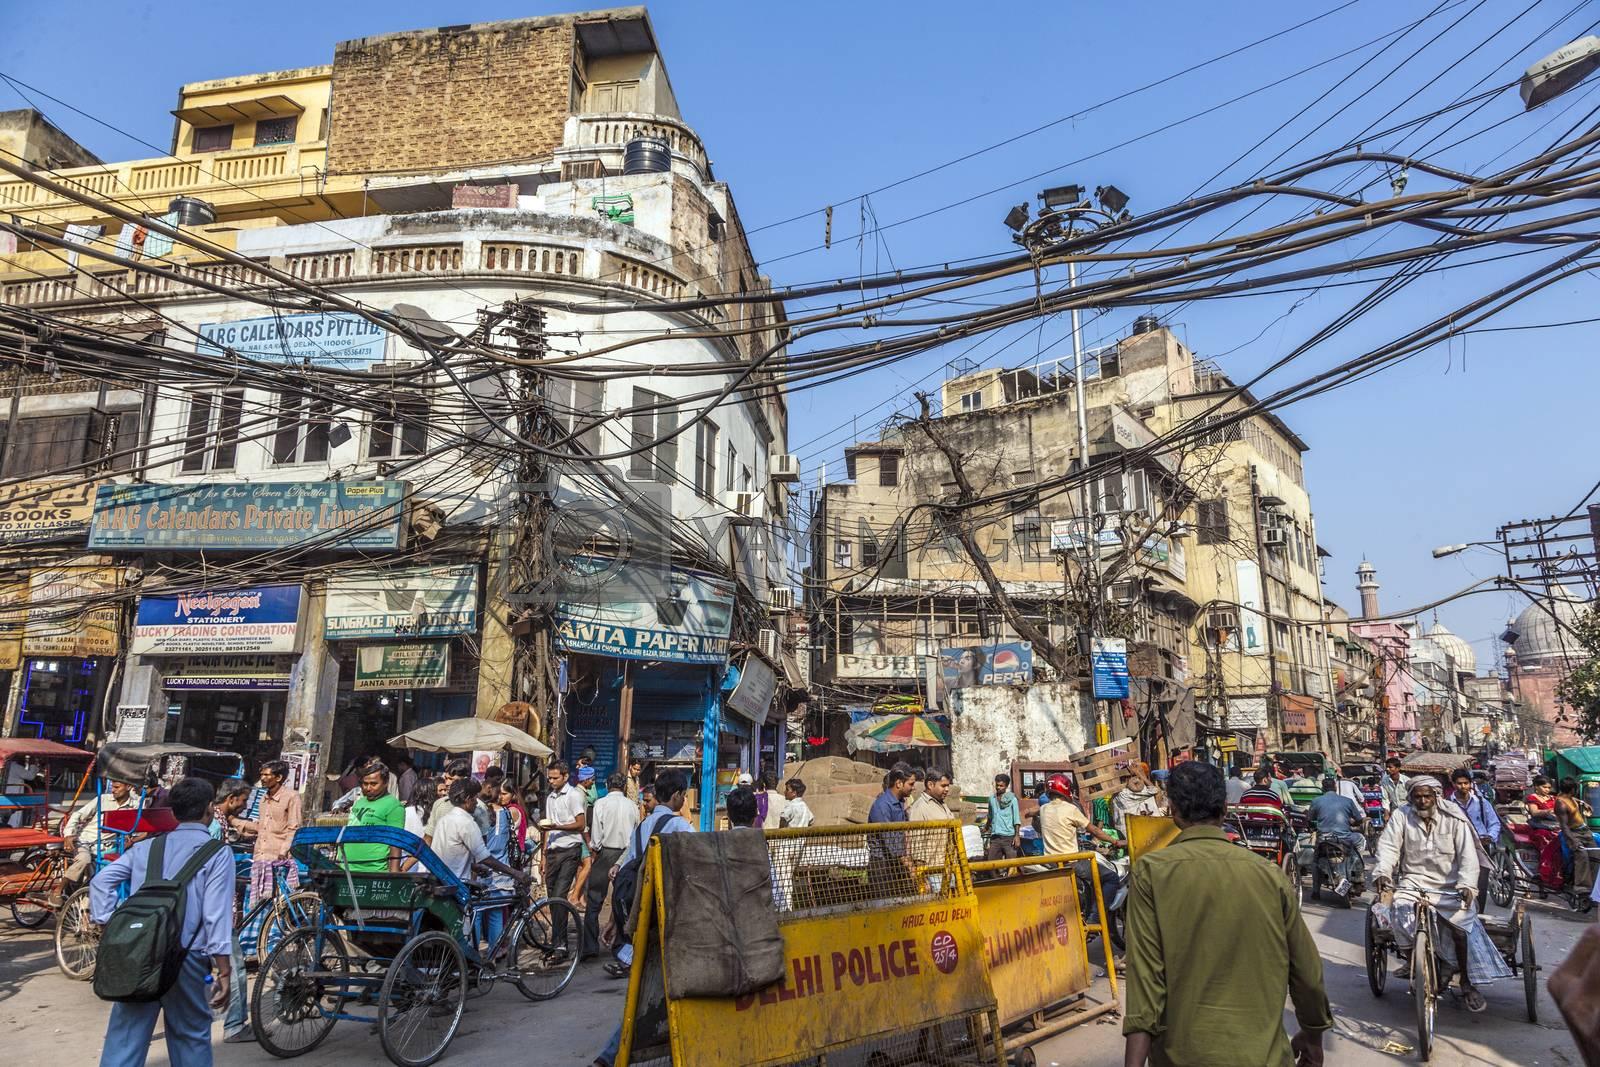 DELHI, INDIA - NOV 9, 2011: people in old Delhi in Chawri Bazaar, the famous old market in Delhi, India. Established in 1840, it was the first wholesale market of Old Delhi